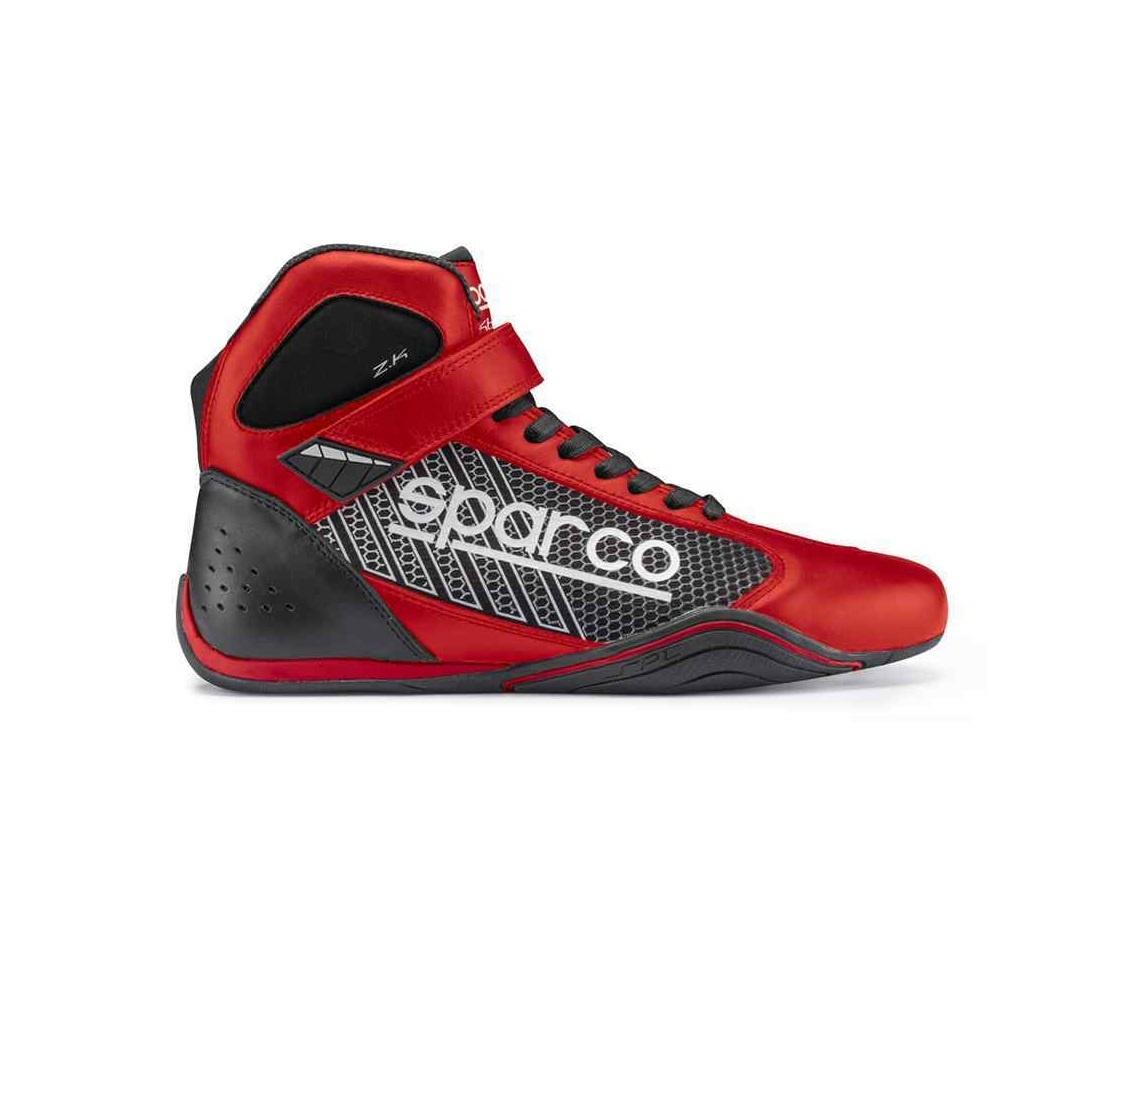 Sparco Omega KB-6 Red